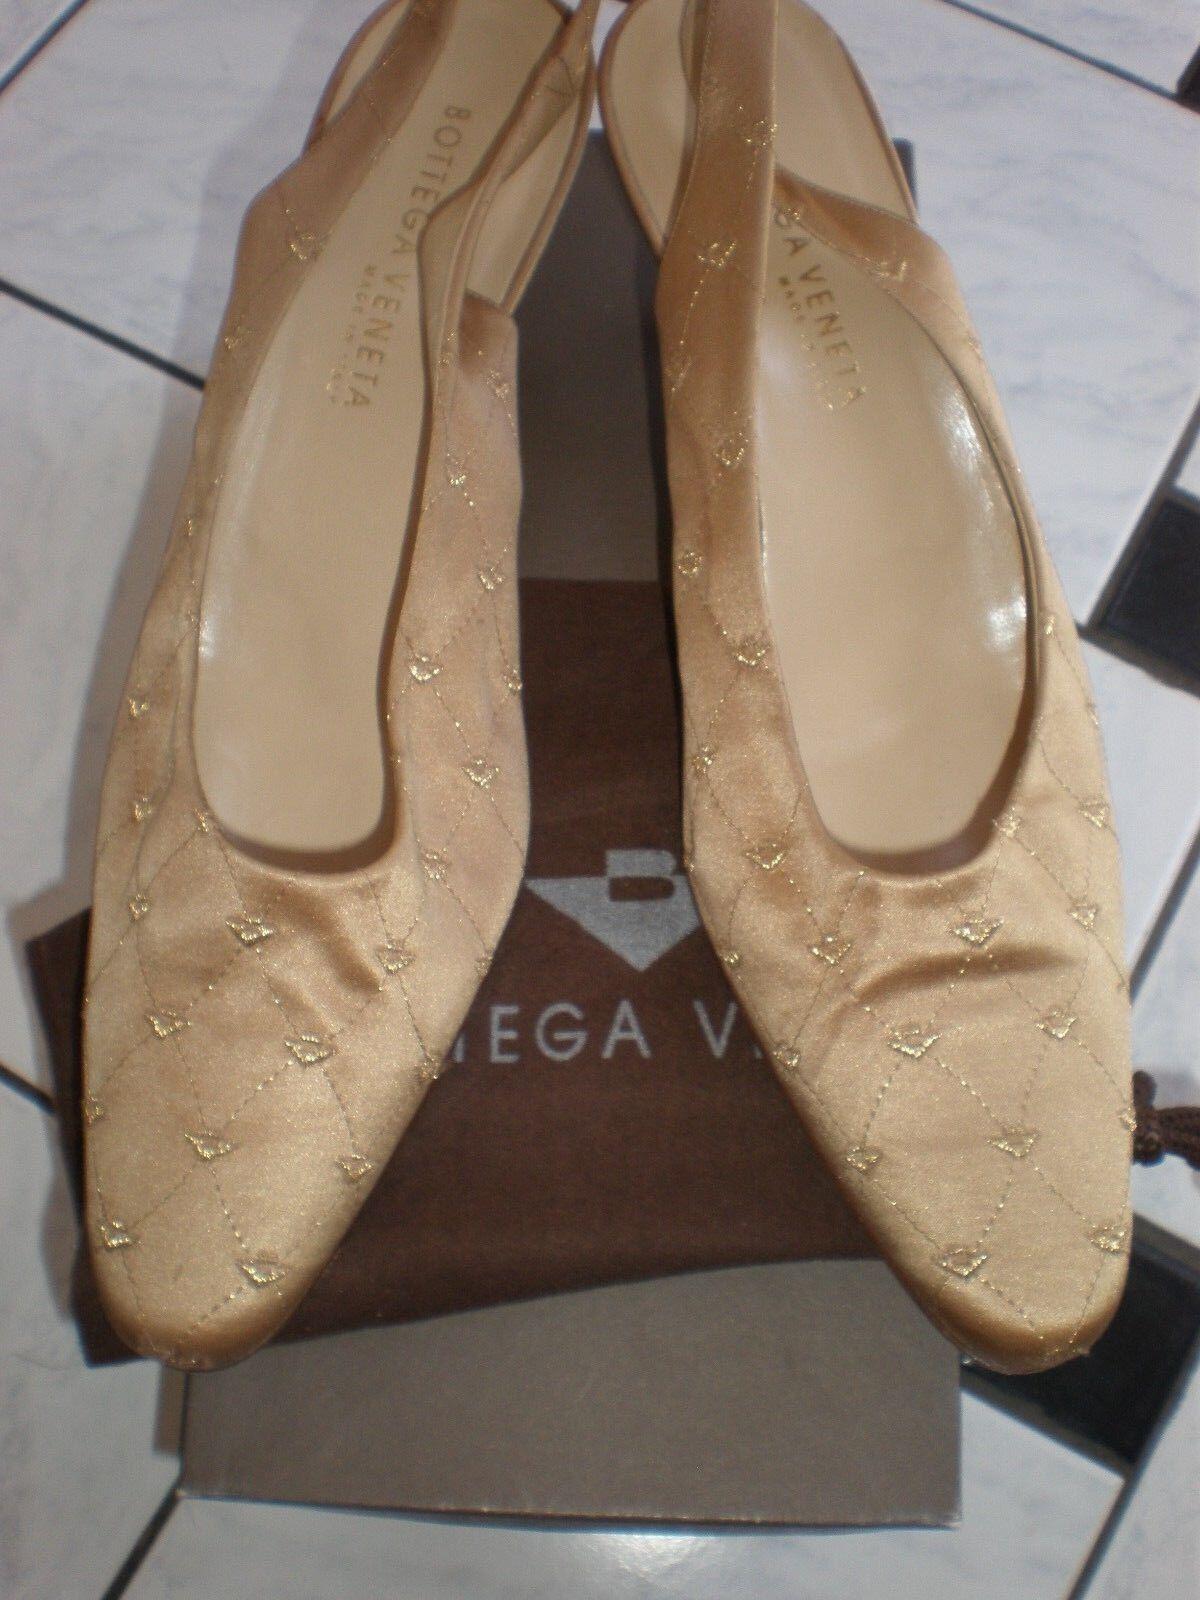 BOTTEGA VENETTA GOLD SATIN SLINGBACKS SABBIA PUMPS HEELS Schuhe SIZE 10 USA CLEAN